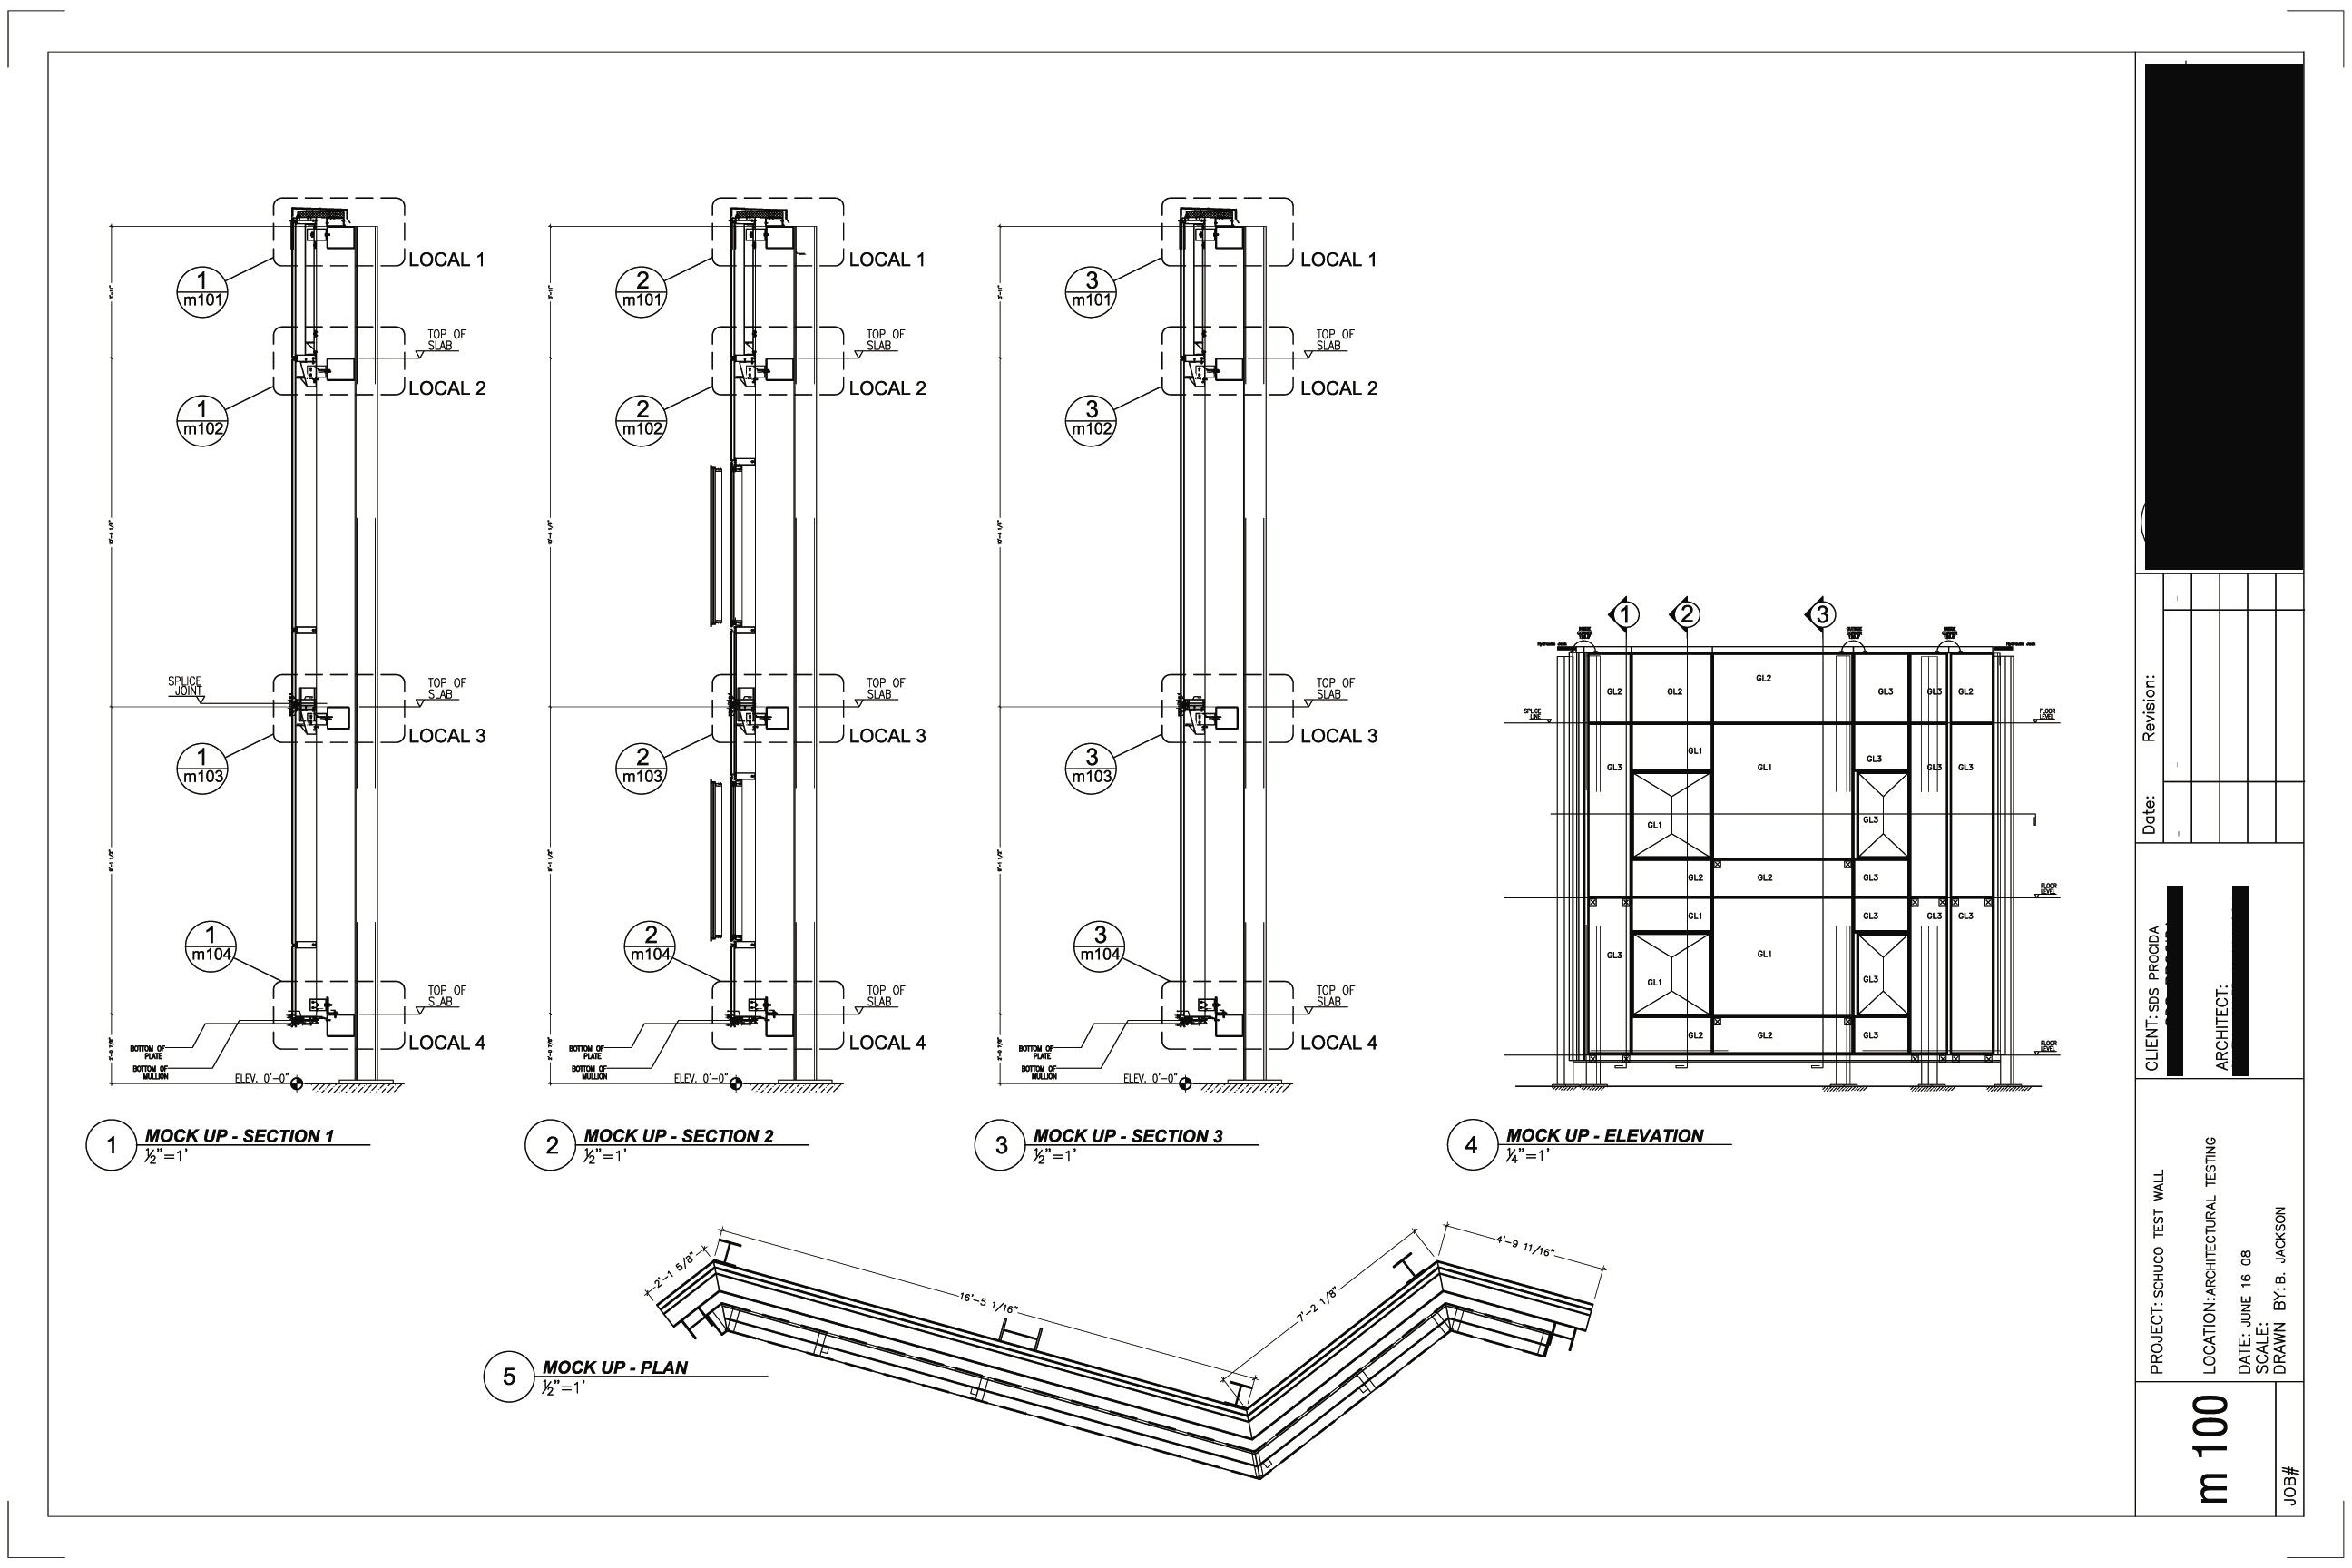 Technical Drawings By Albert B Jackson At Coroflot Com. Curtain Wall Section